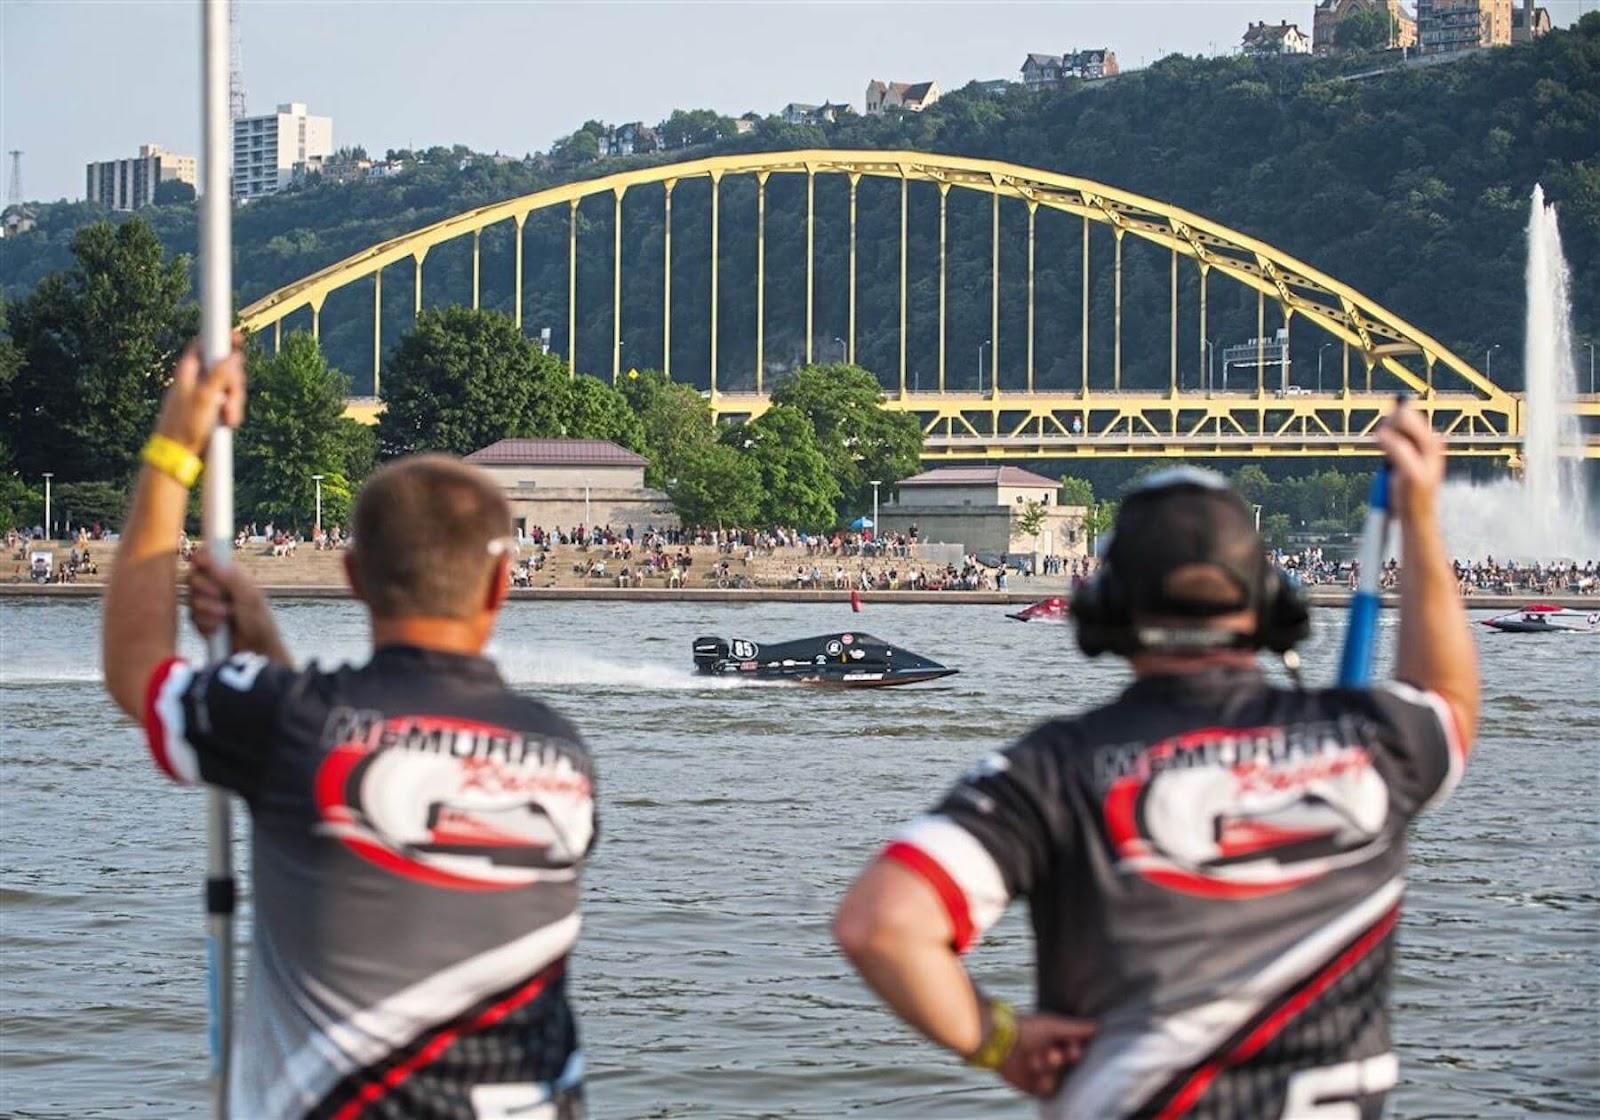 boat racing in the Three Rivers Regatta